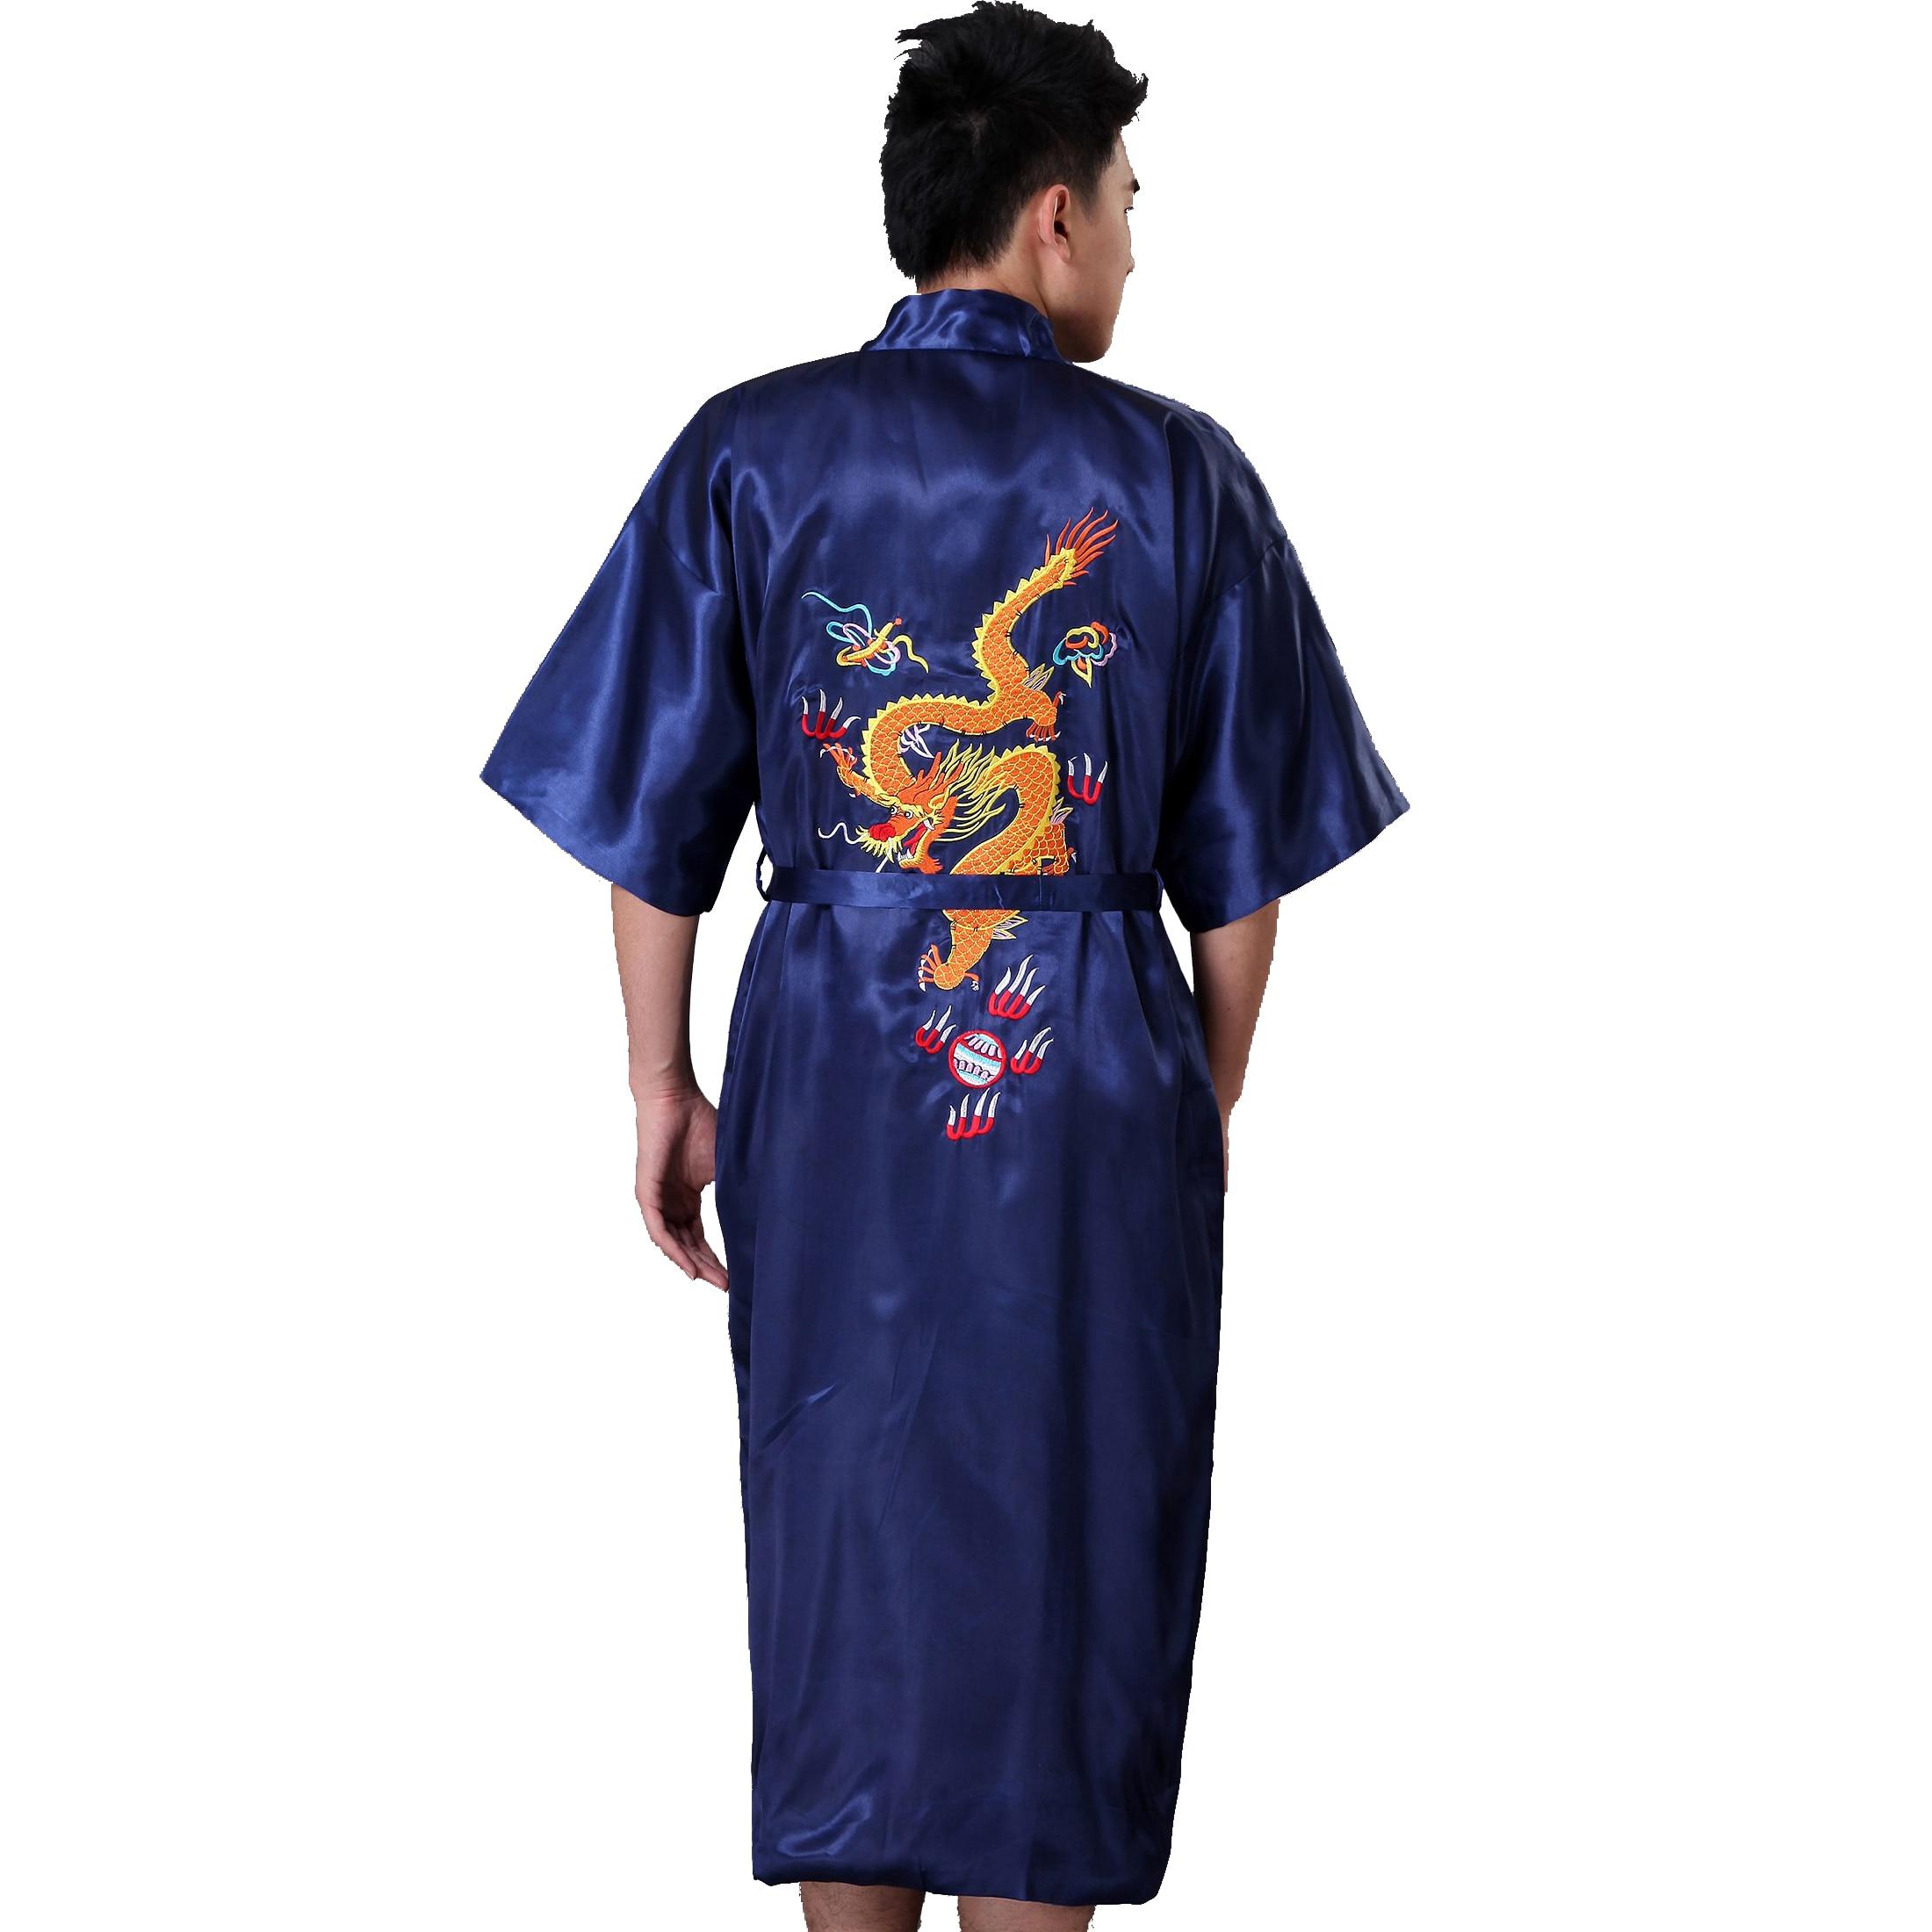 Black Traditional Chinese Menb Silk Satin Robe Embroider Kimono Gown Dragon Bathrobe Sleepwear Size S M L XL XXL XXXL